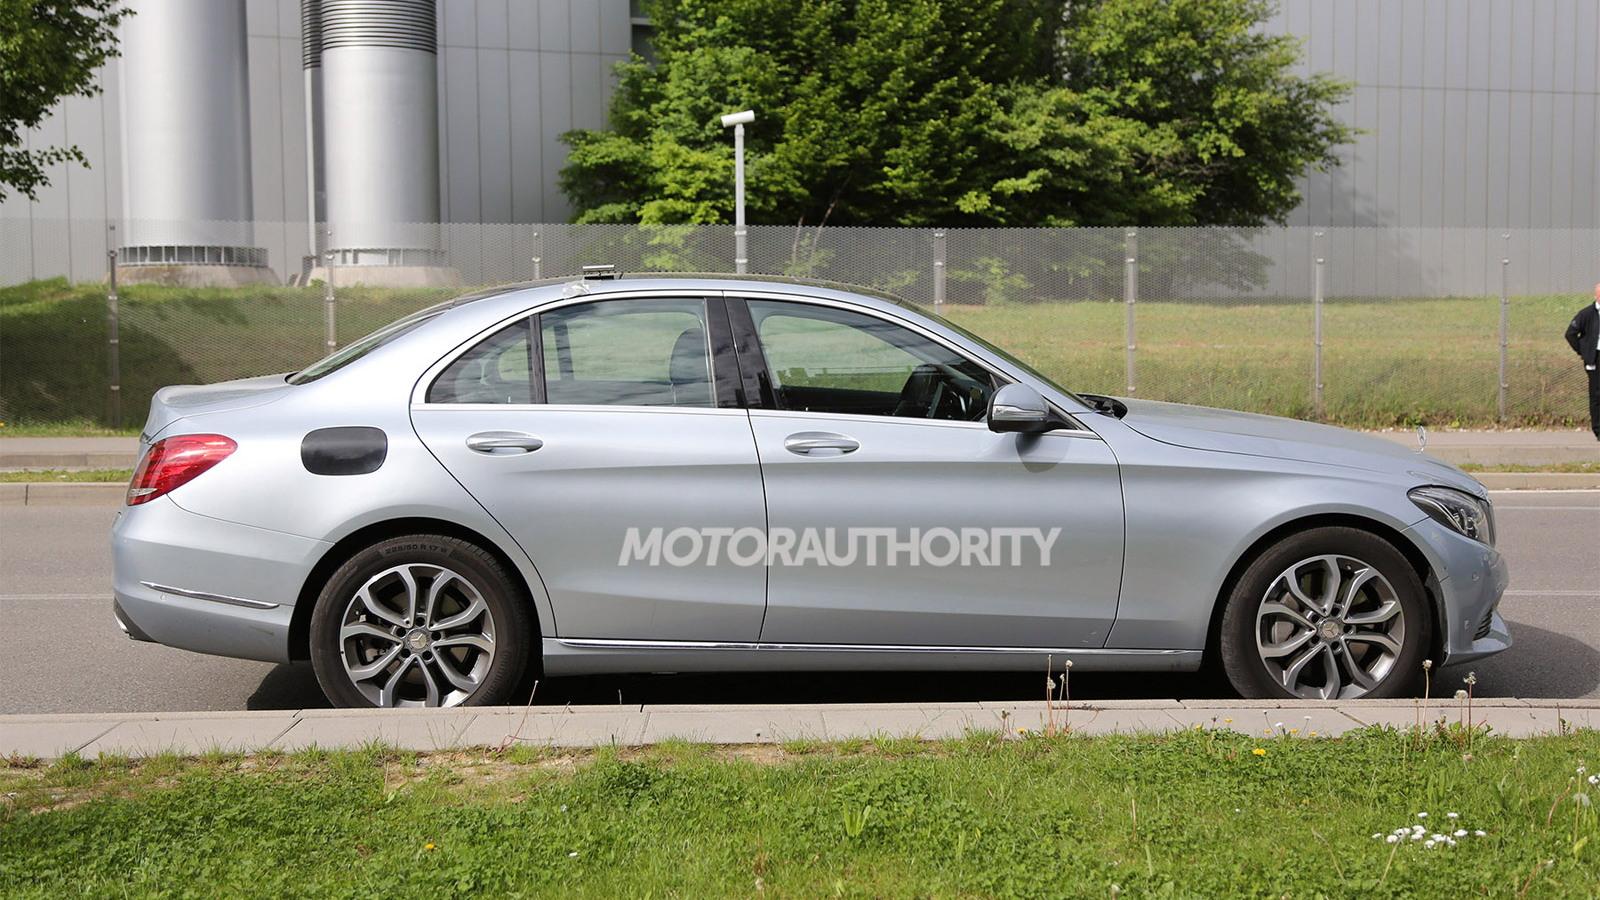 2016 Mercedes-Benz C-Class Plug-In Hybrid spy shots